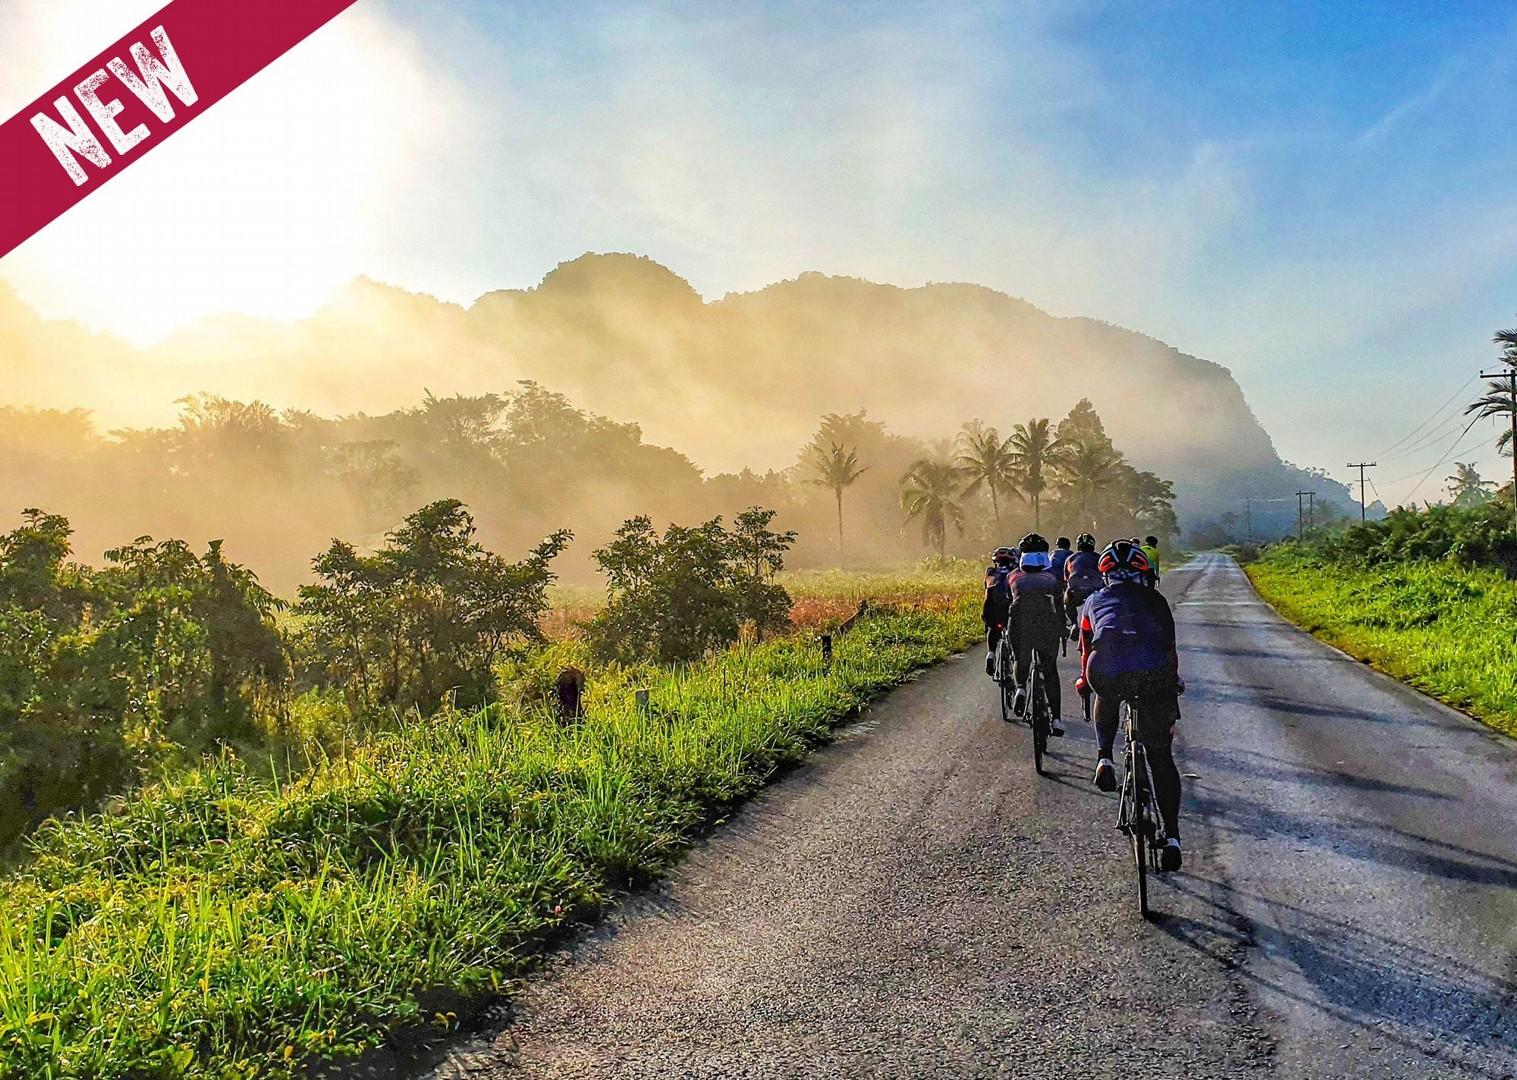 borneoroad.jpg - Borneo - Sarawak to Sabah - Guided Road Cycling Holiday - Road Cycling